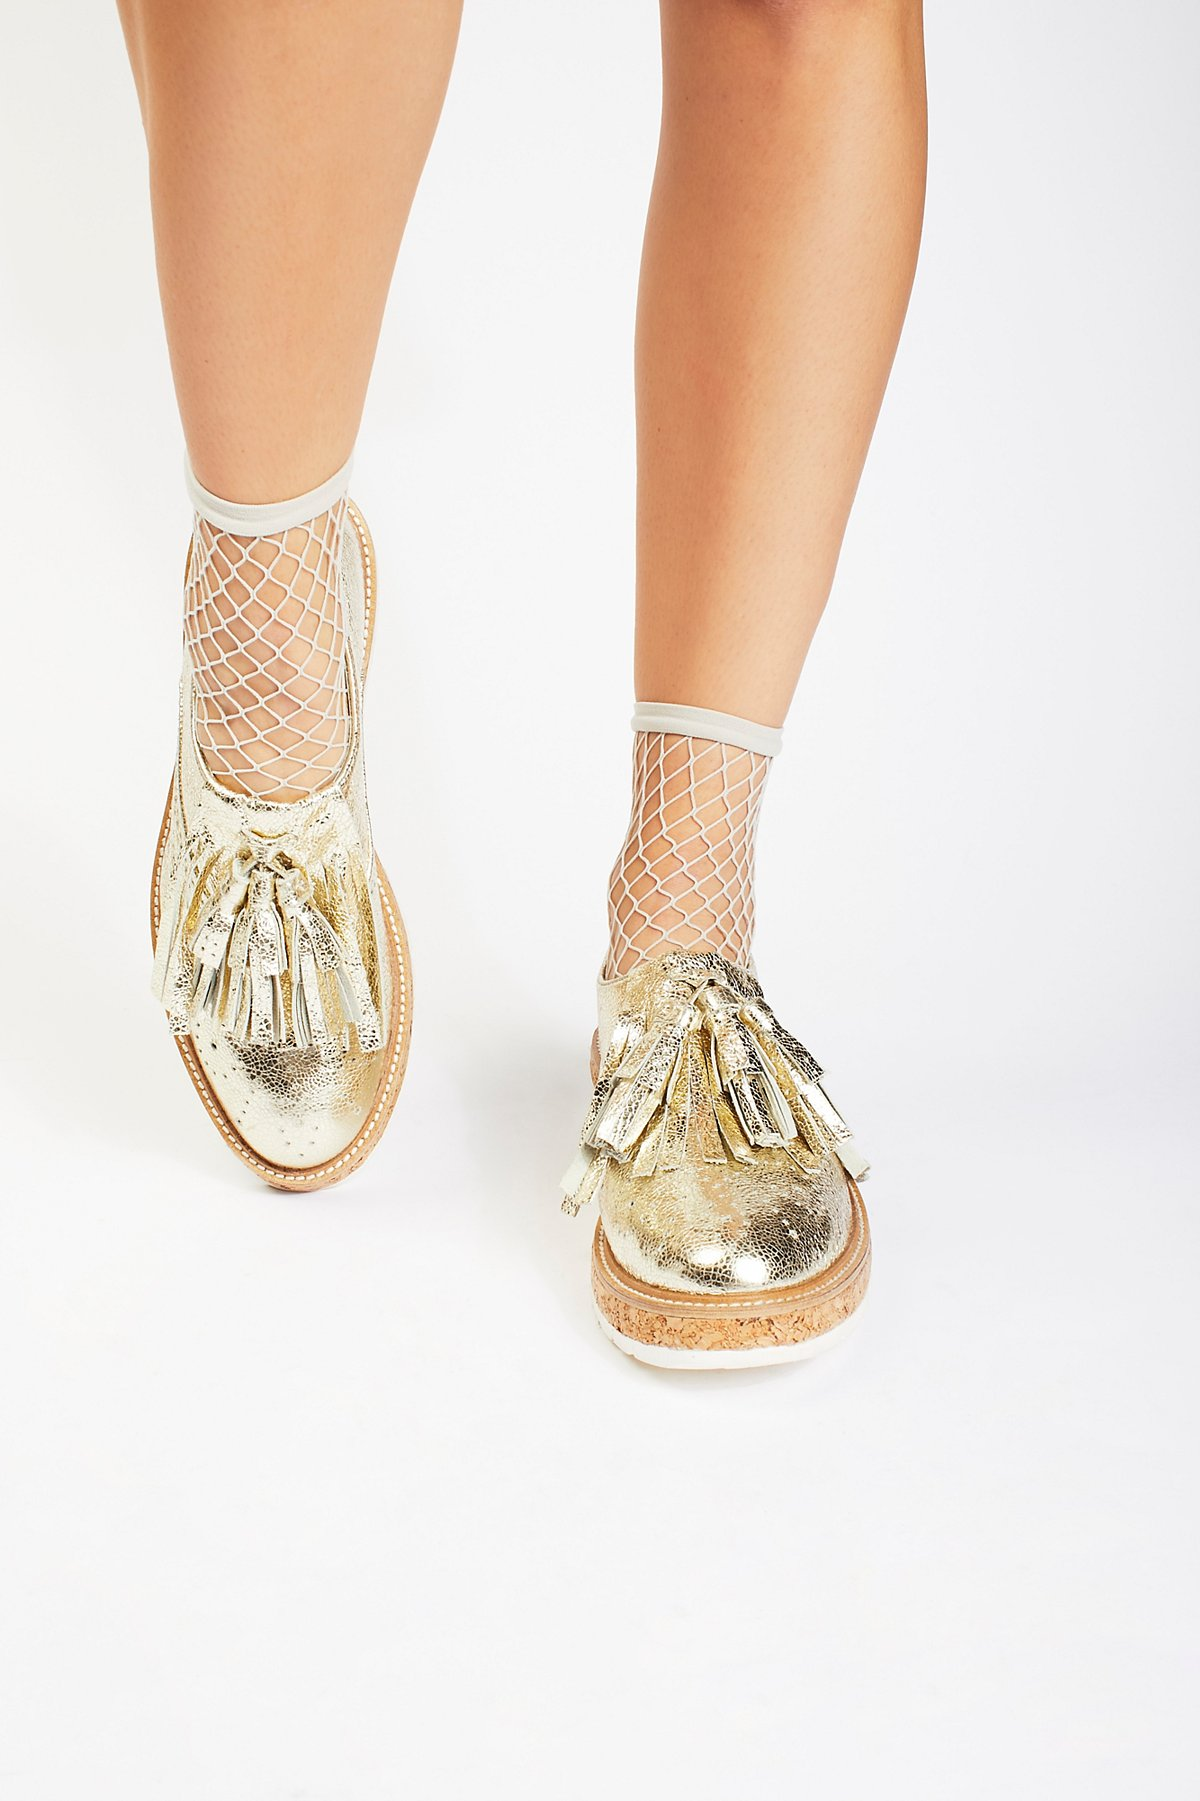 Nevada套穿式男装风乐福鞋